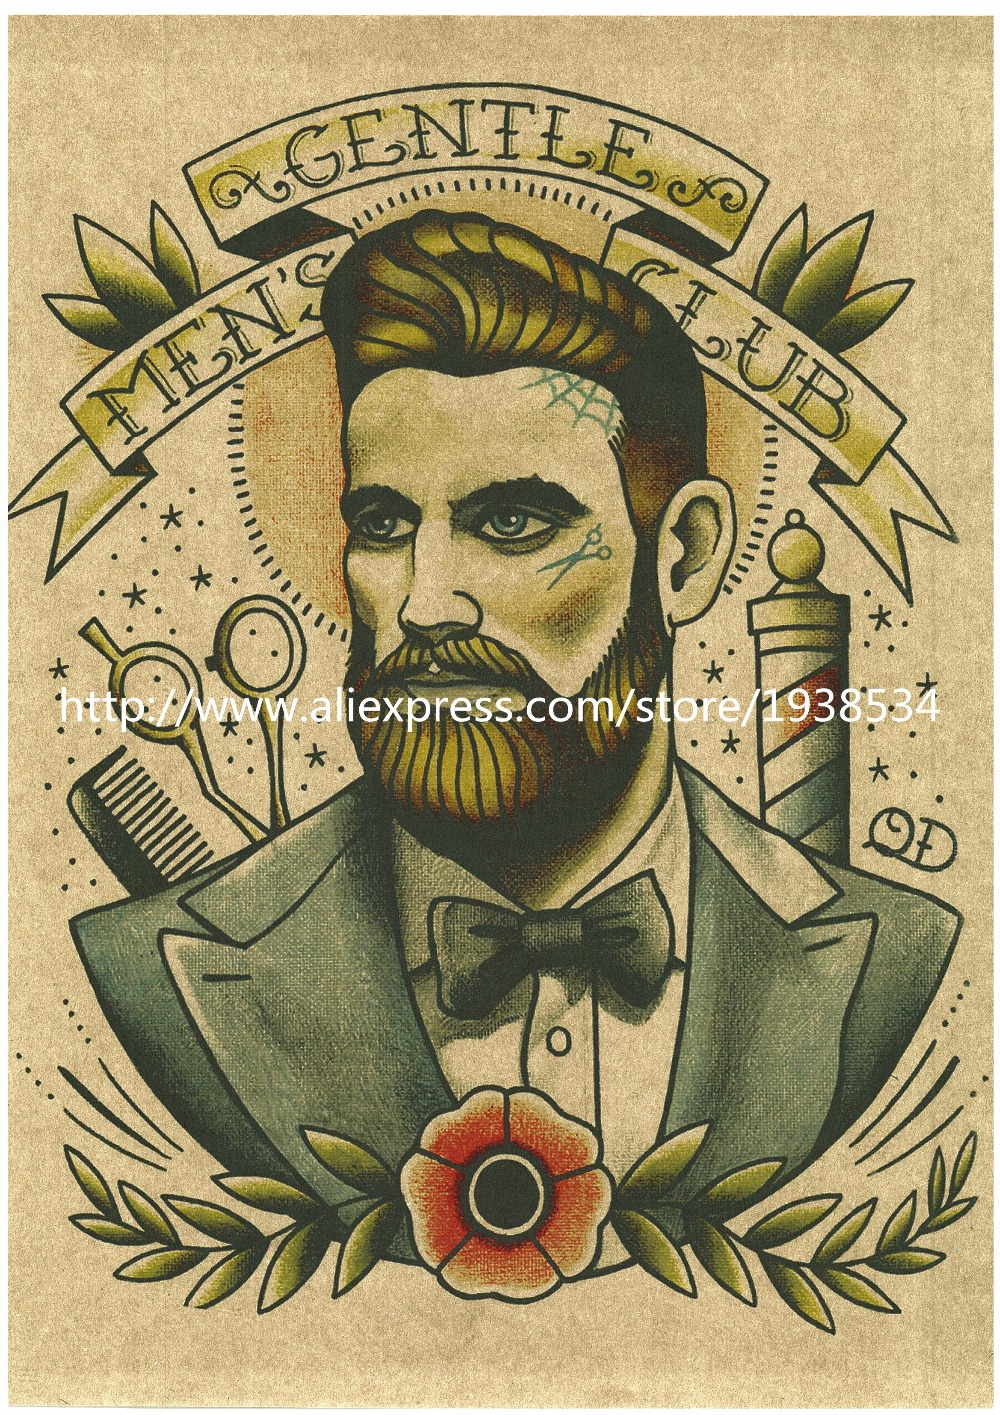 Vintage Tattoos Patterned Posters Kraft paper Interior ...